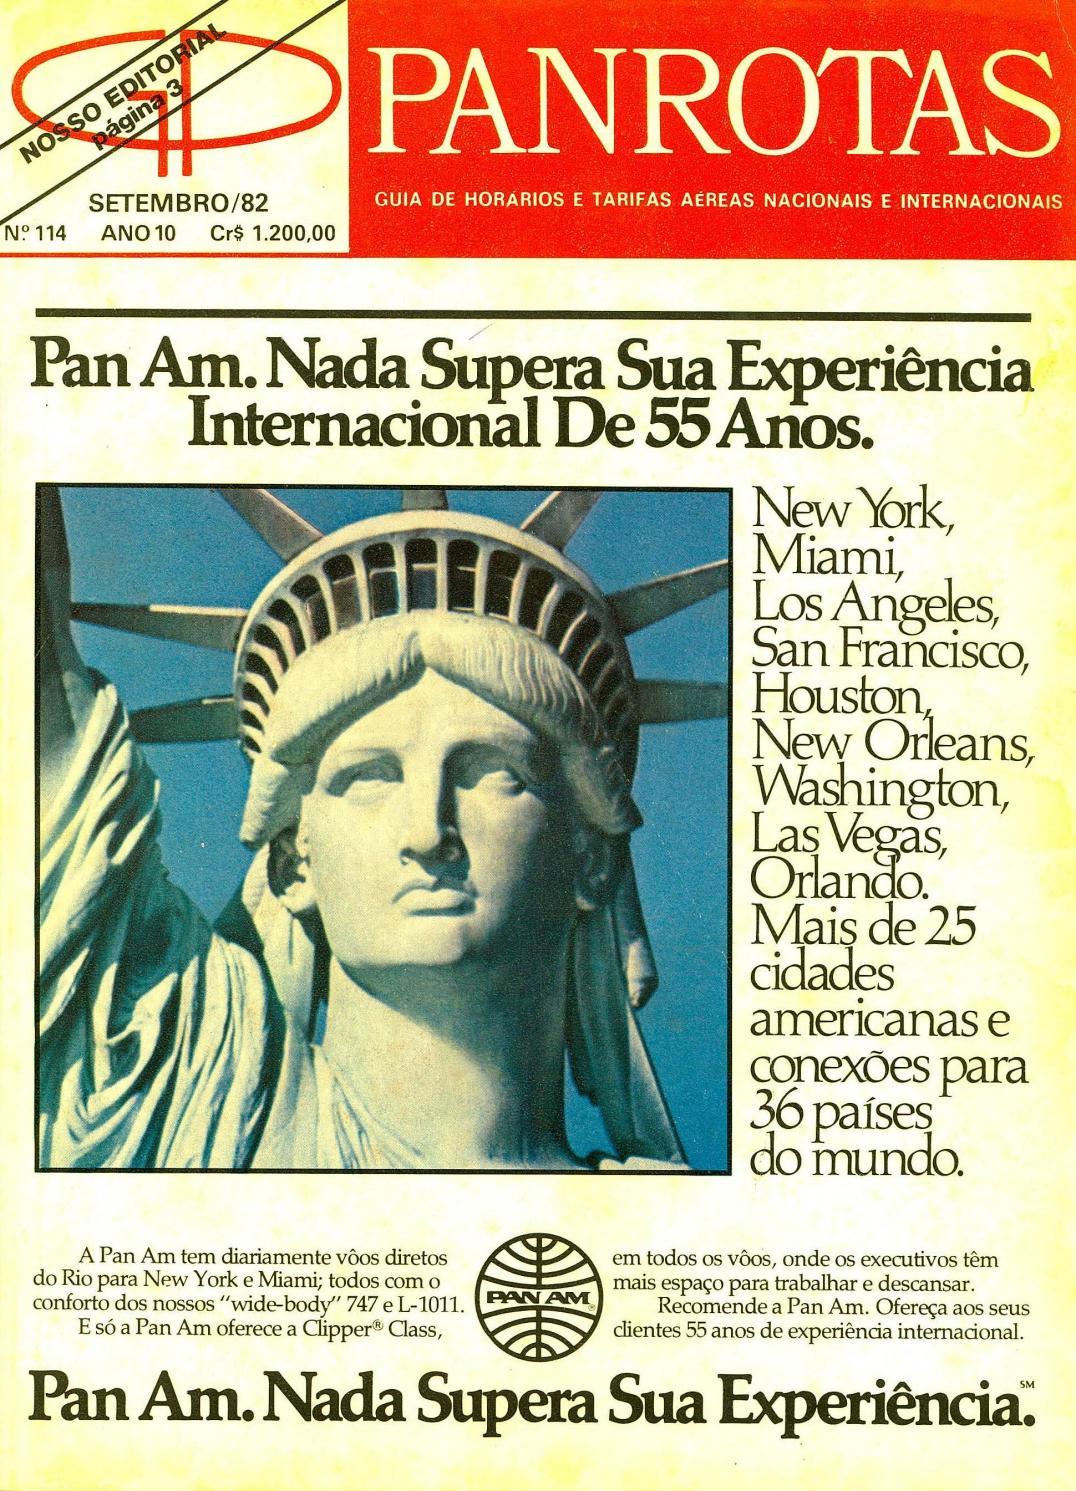 b3256f8e575 Guia PANROTAS - Edição 114 - Setembro 1982 by PANROTAS Editora - issuu